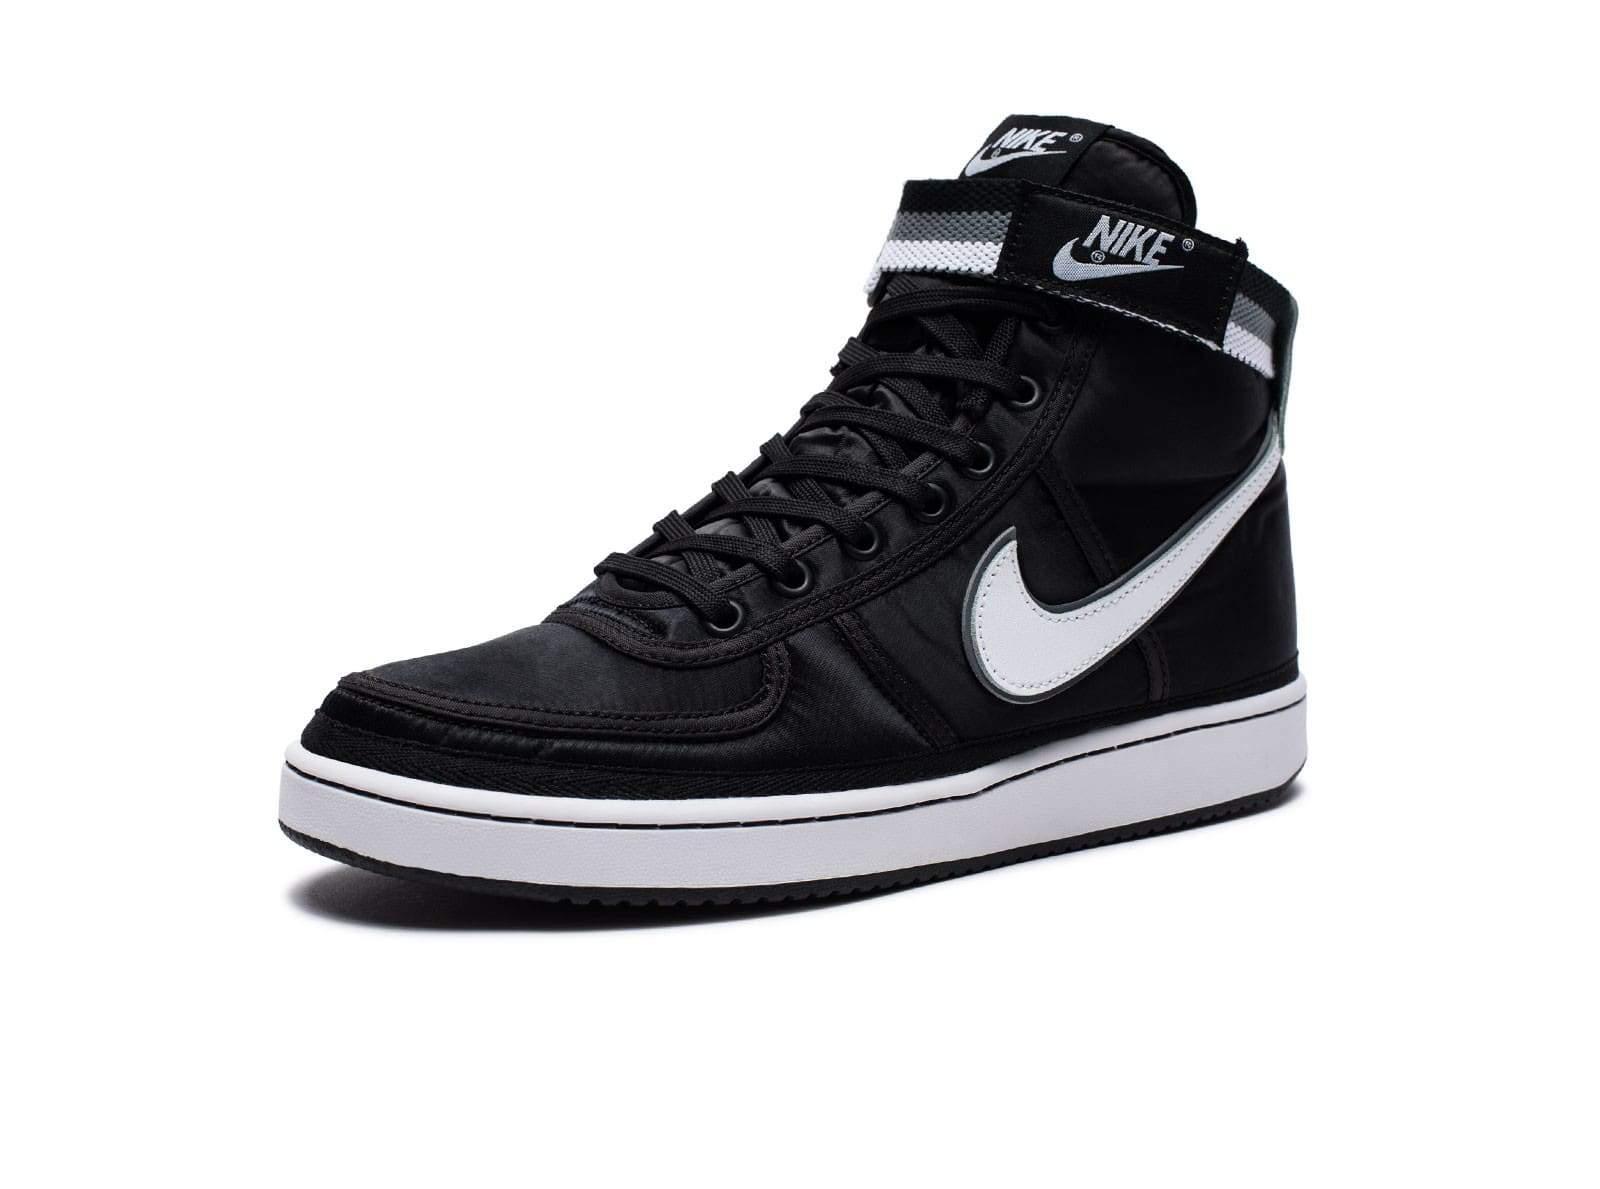 Nike Vandal Supreme